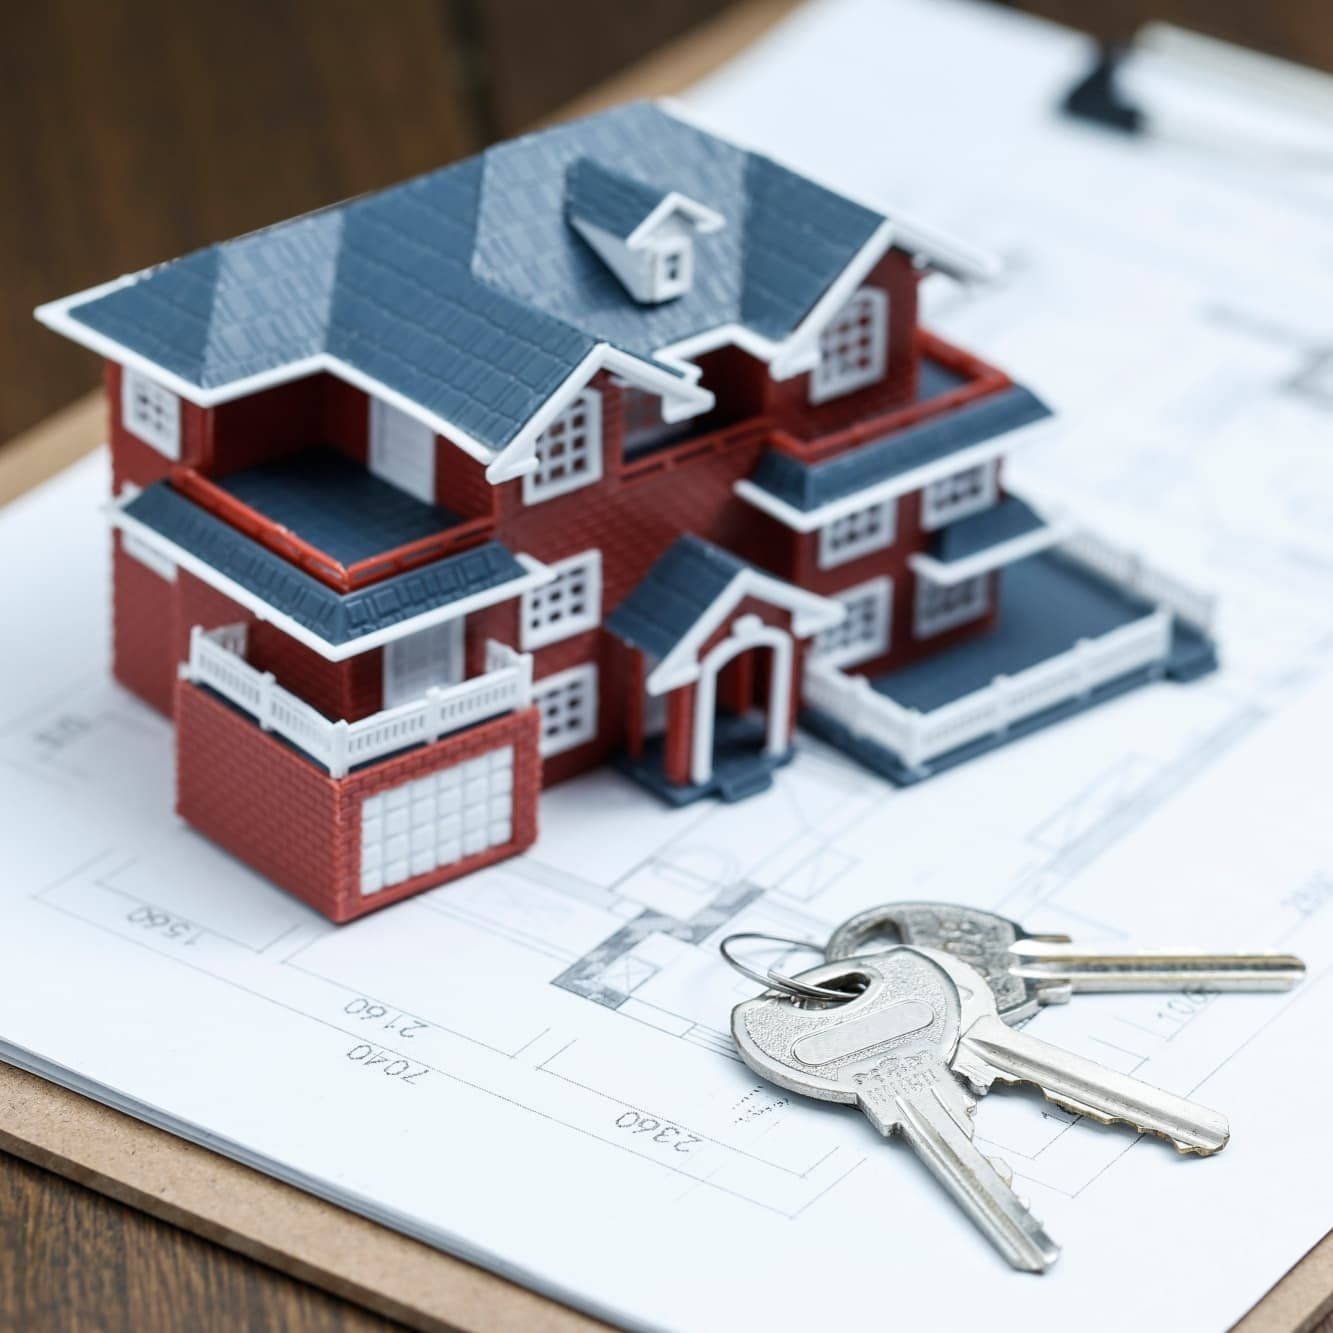 villa-house-model-key-drawing-retro-desktop-real-estate-sale-concept